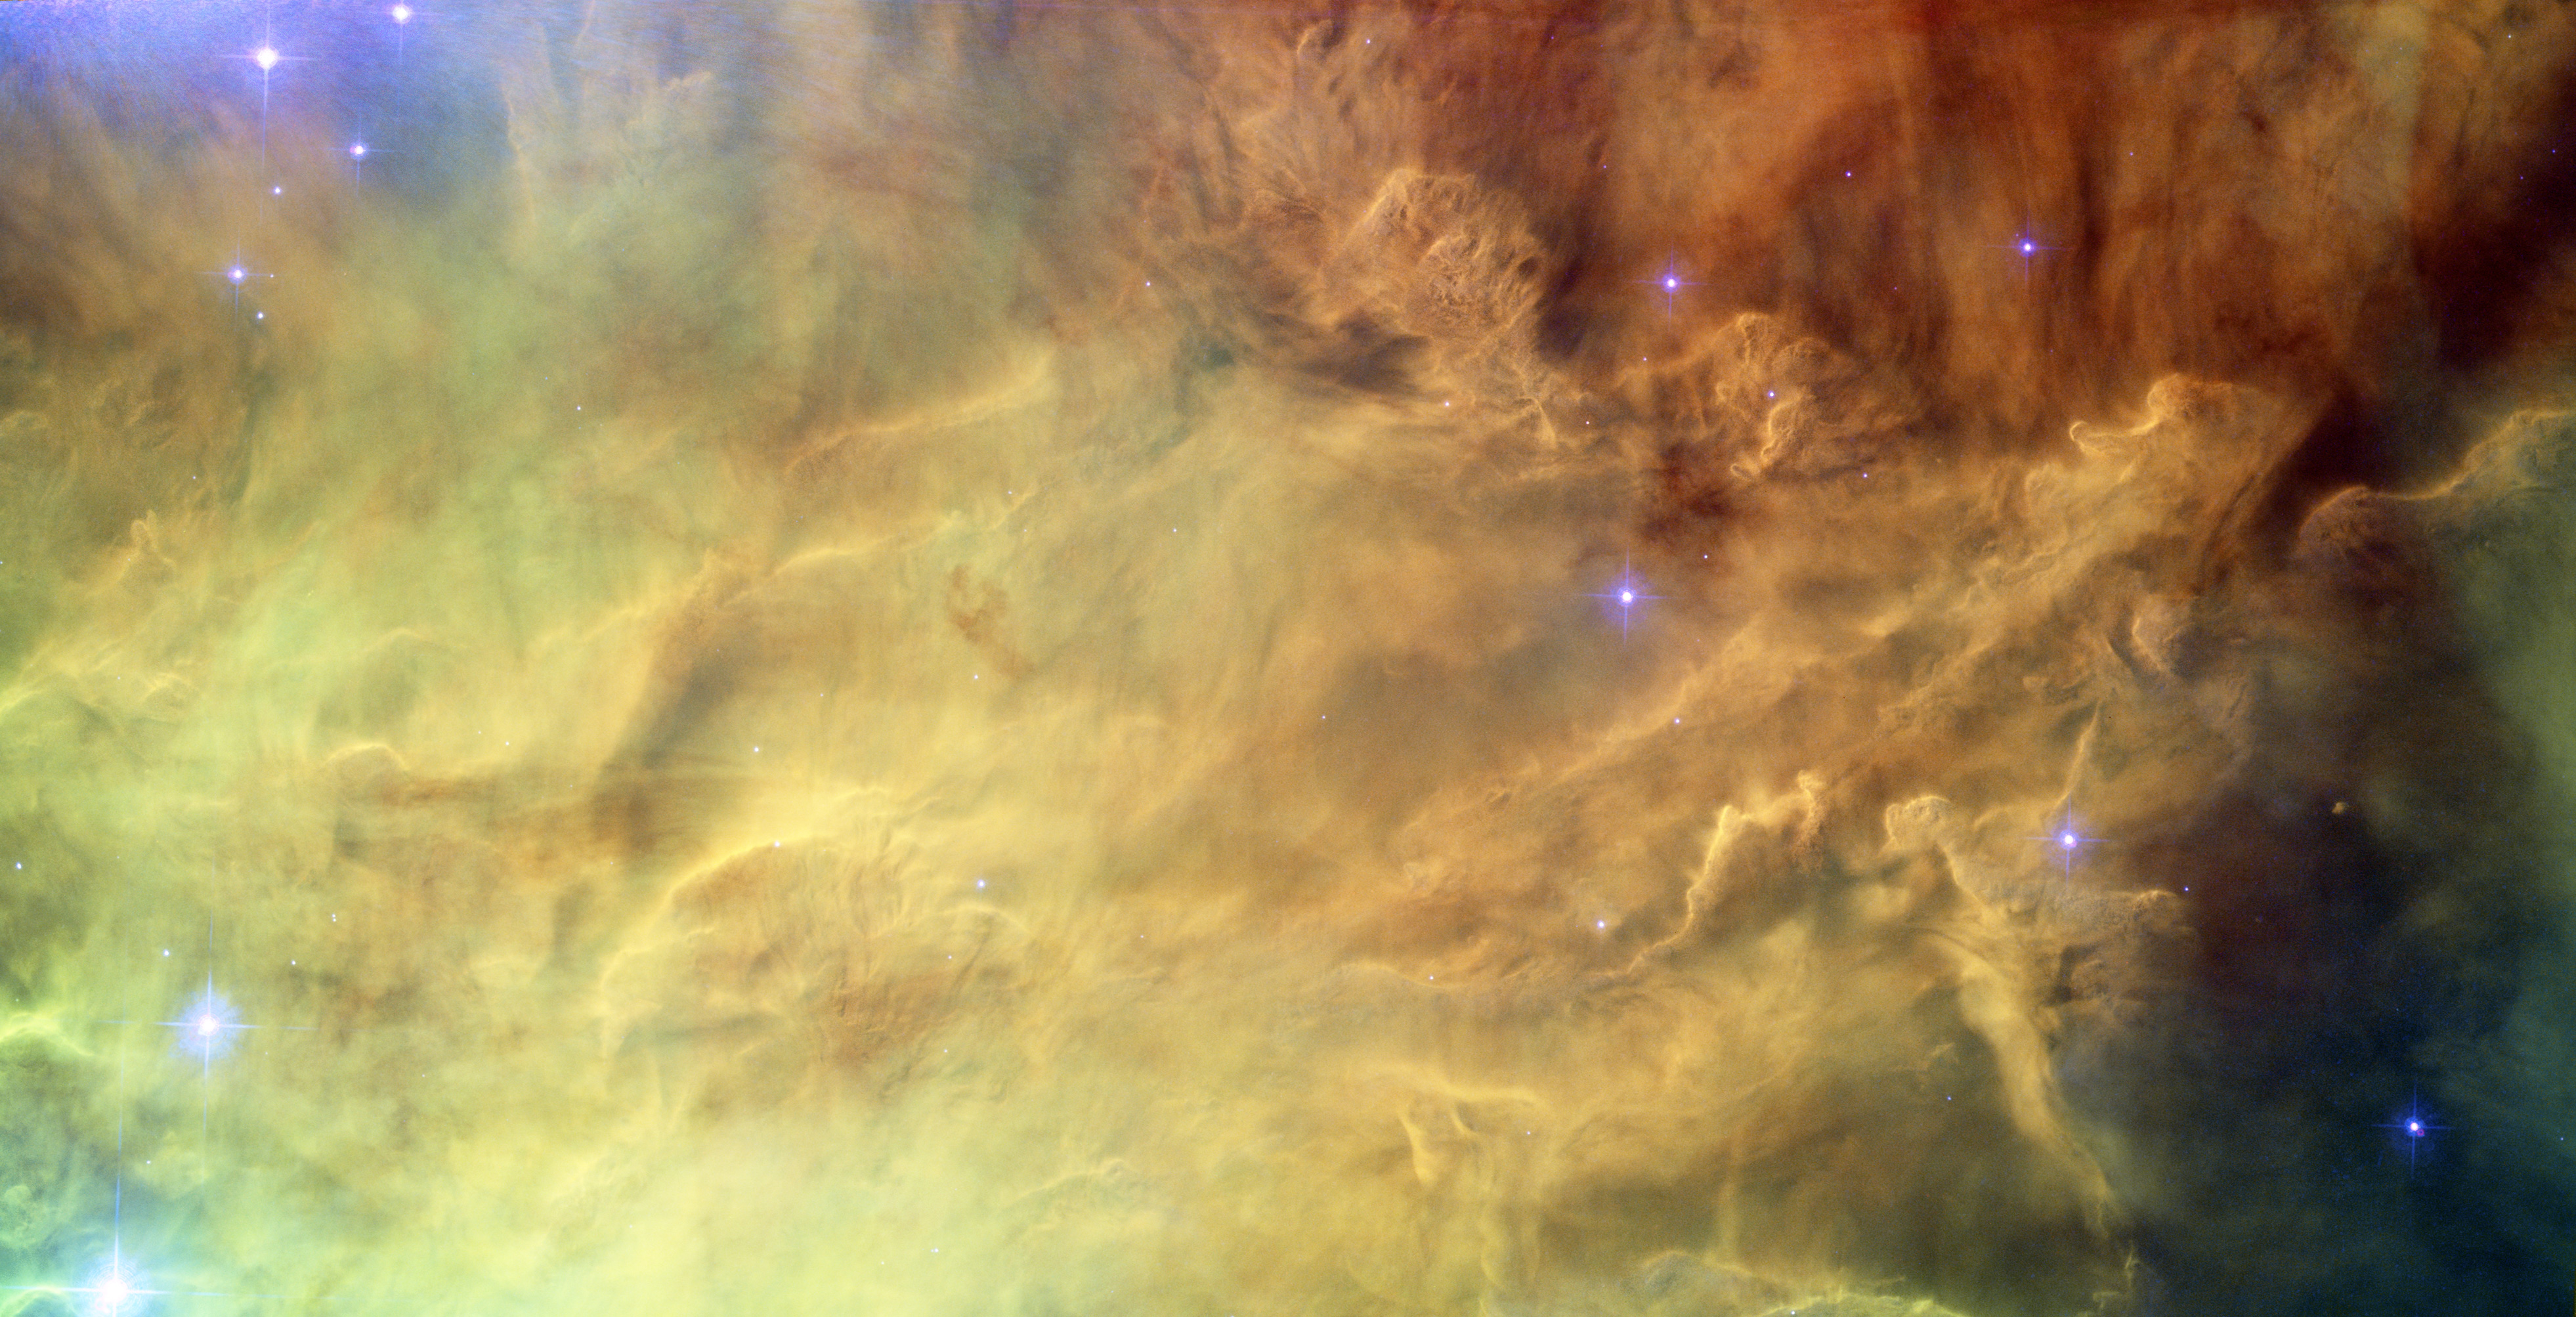 Hubble's Lagoon Credit: NASA, ESA, Hubble Space Telescope